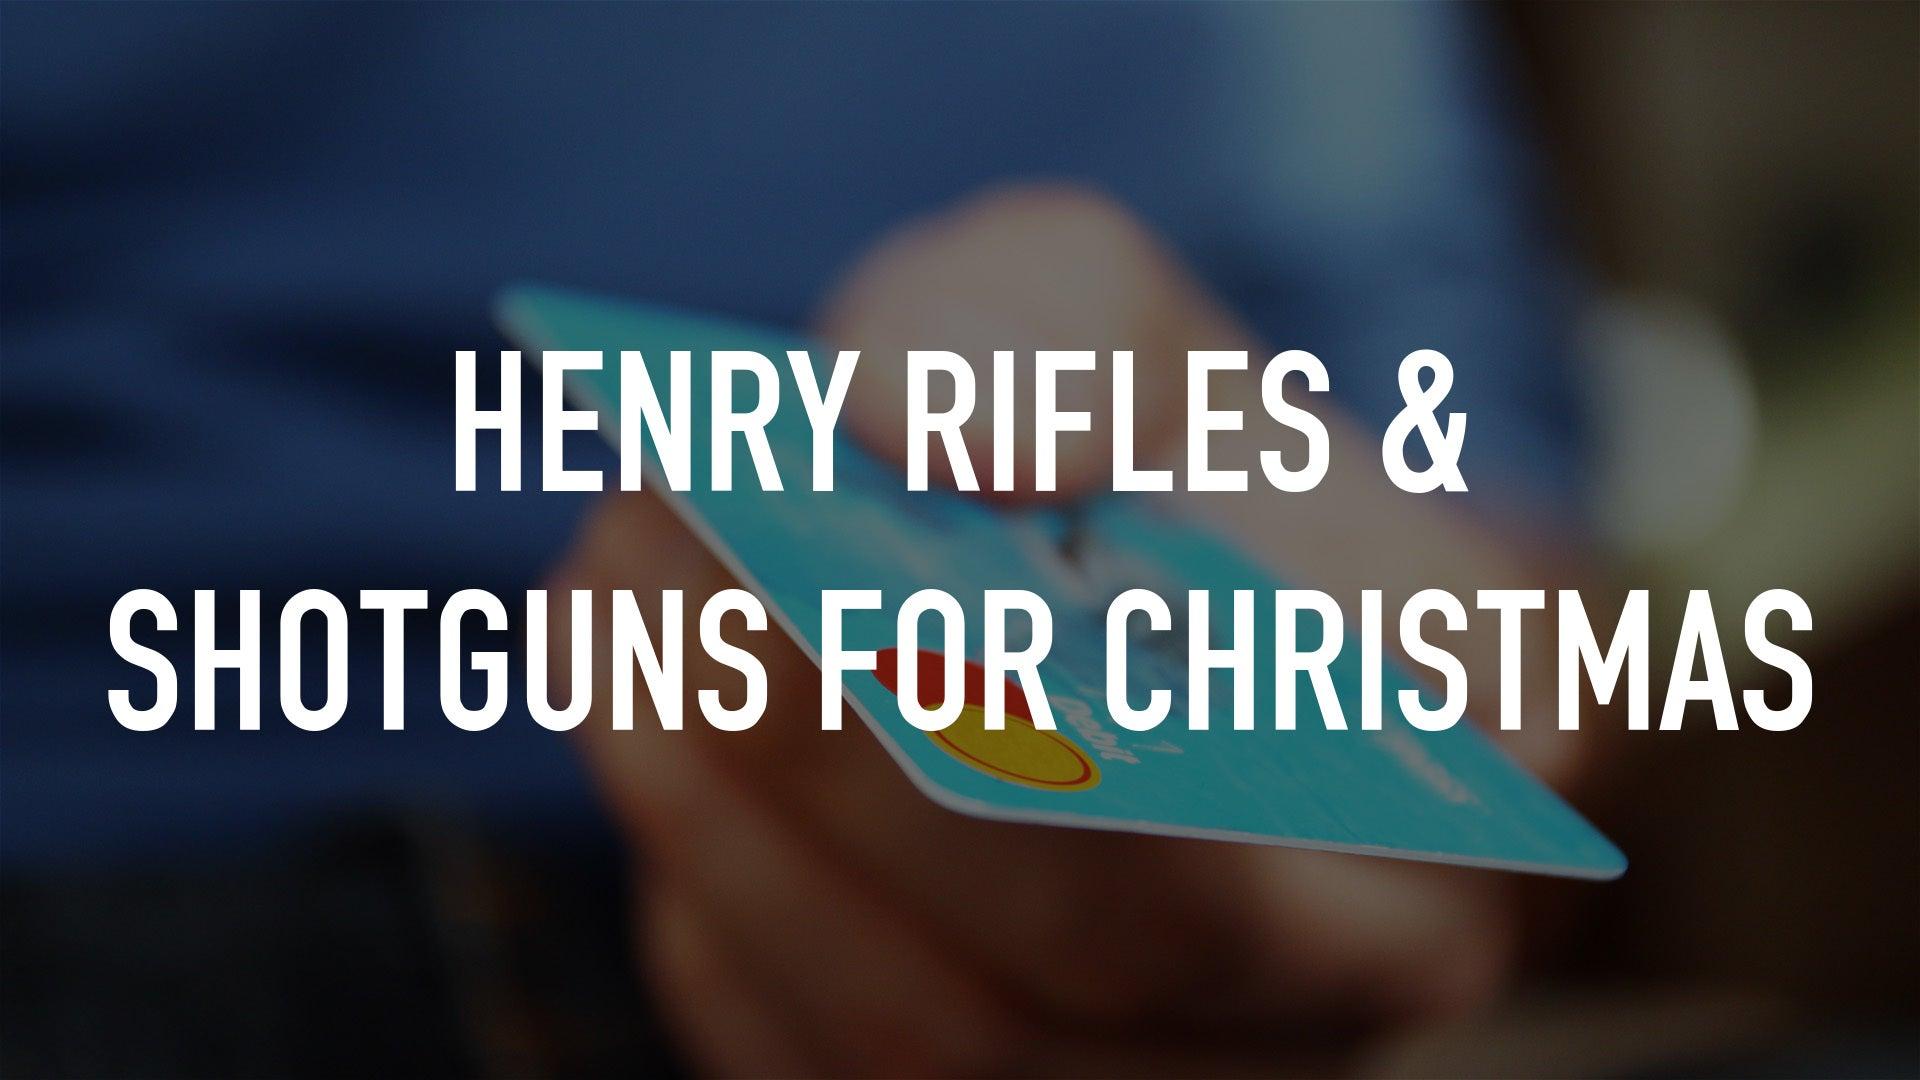 Henry Rifles & Shotguns for Christmas